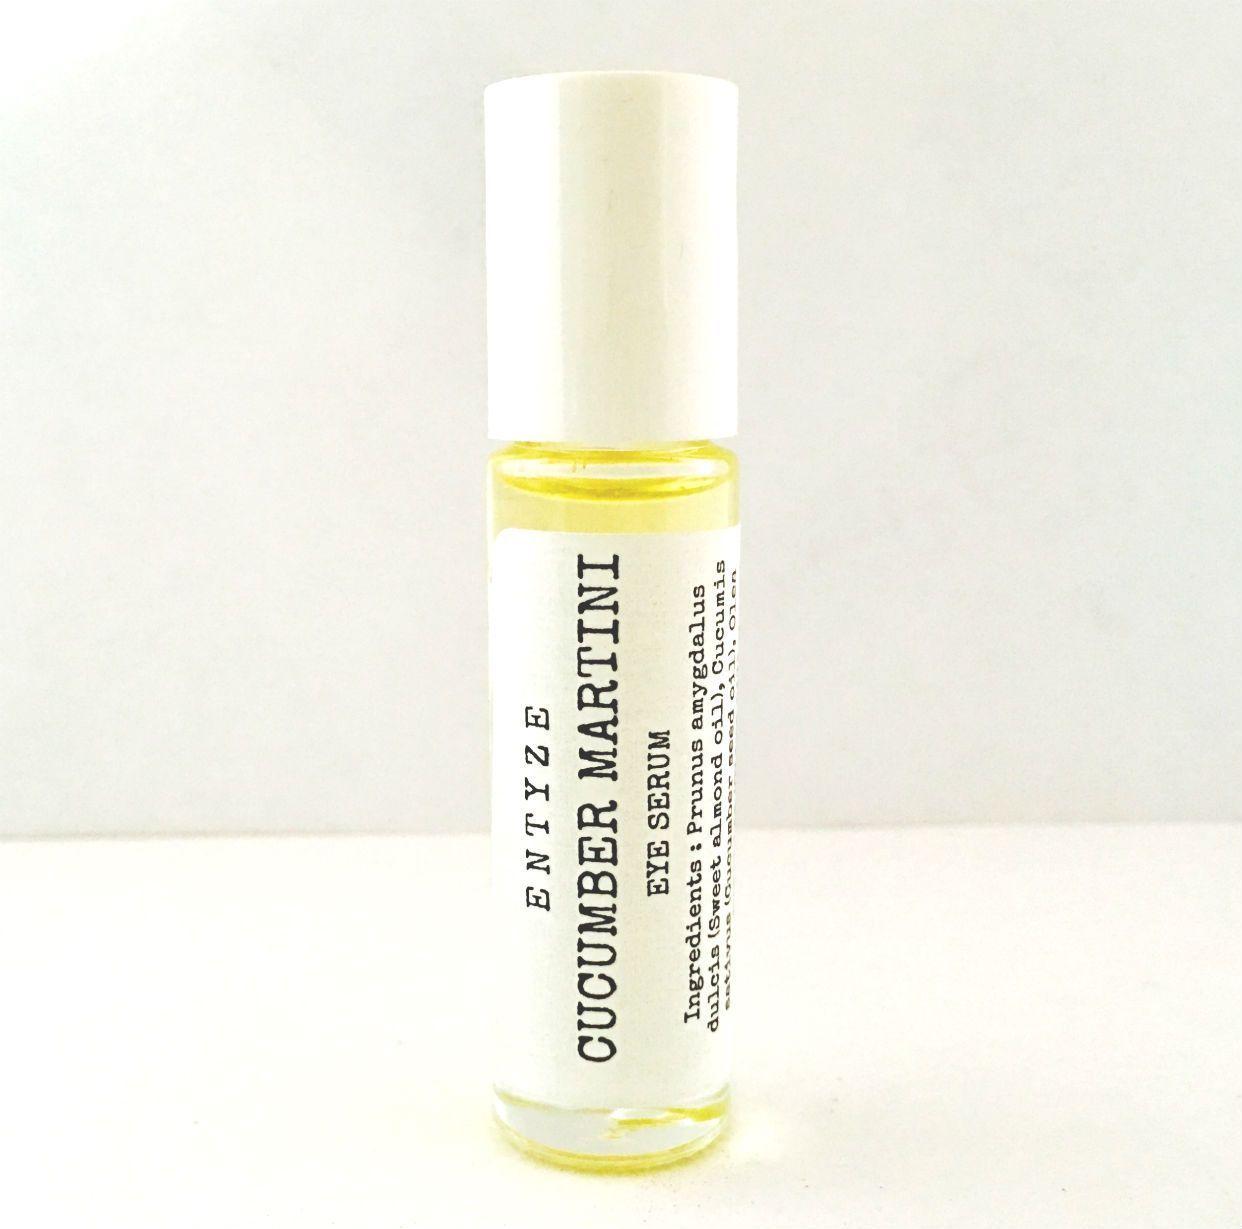 Agm Fashion Bioaqua Toner Products Pinterest Oil Control Serum Wajah Wonder Essense Blueberry Whitening And